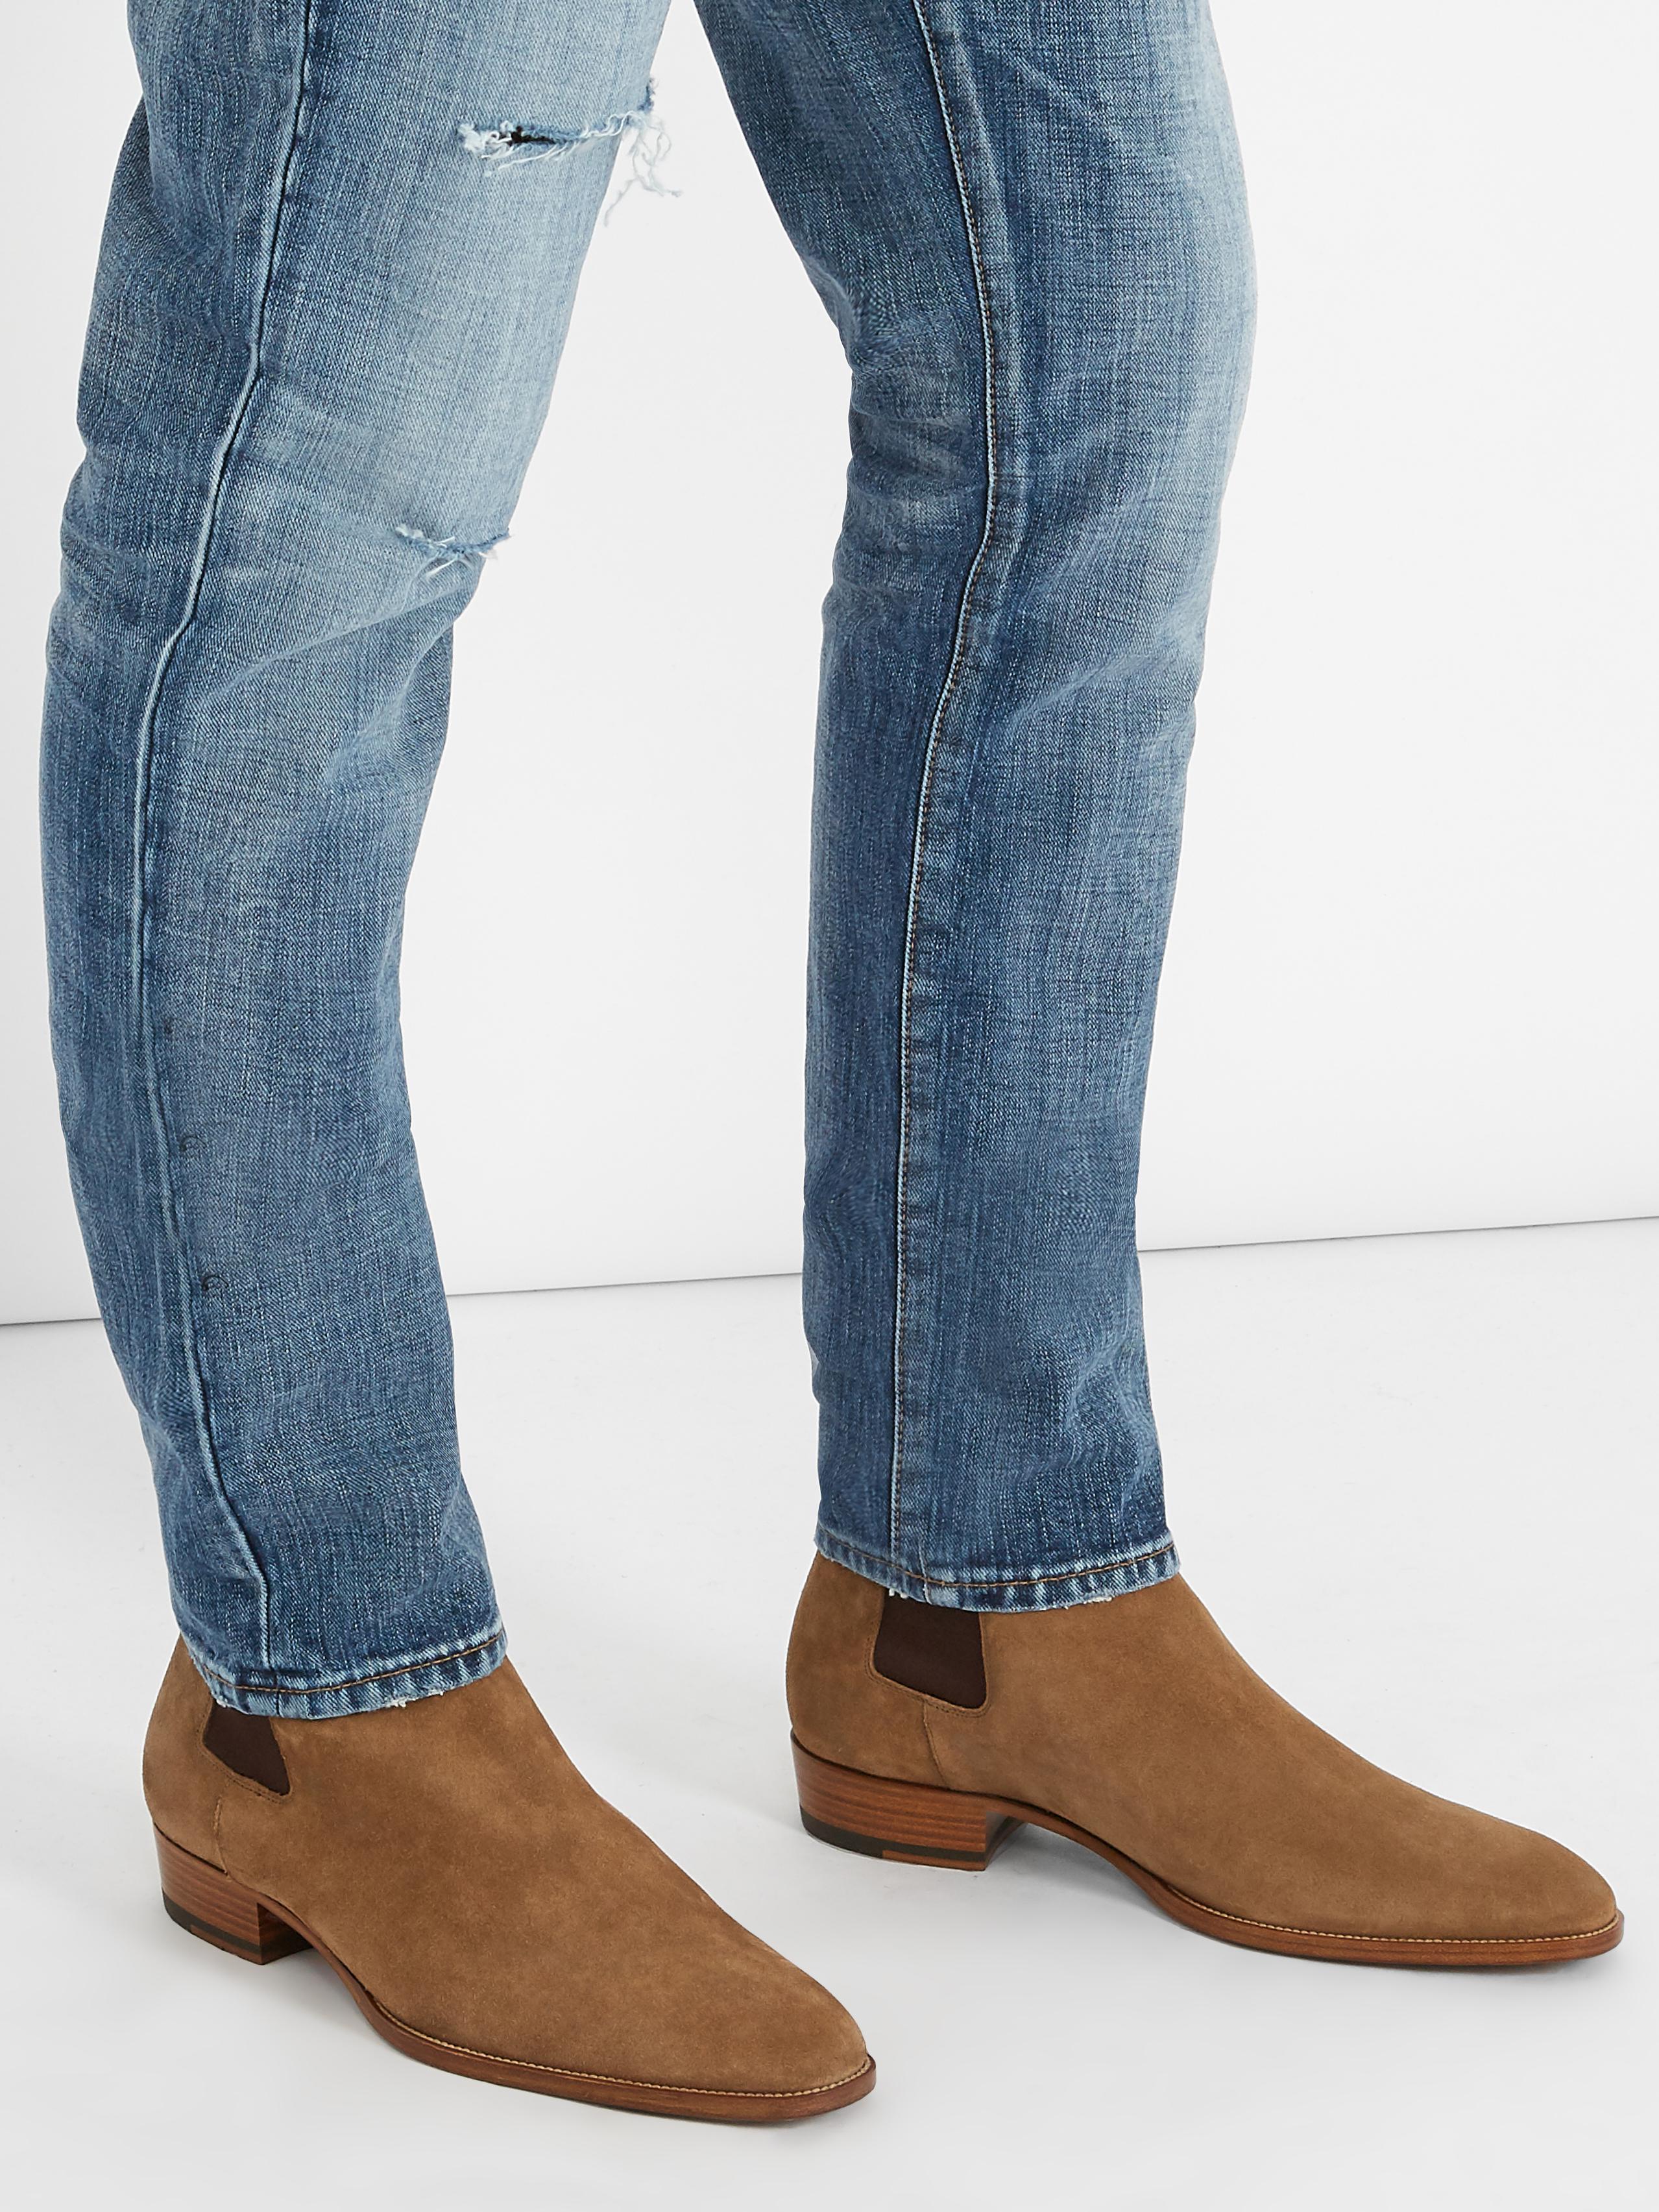 372e79ebcccc Lyst - Saint Laurent Wyatt Suede Chelsea Boots in Brown for Men